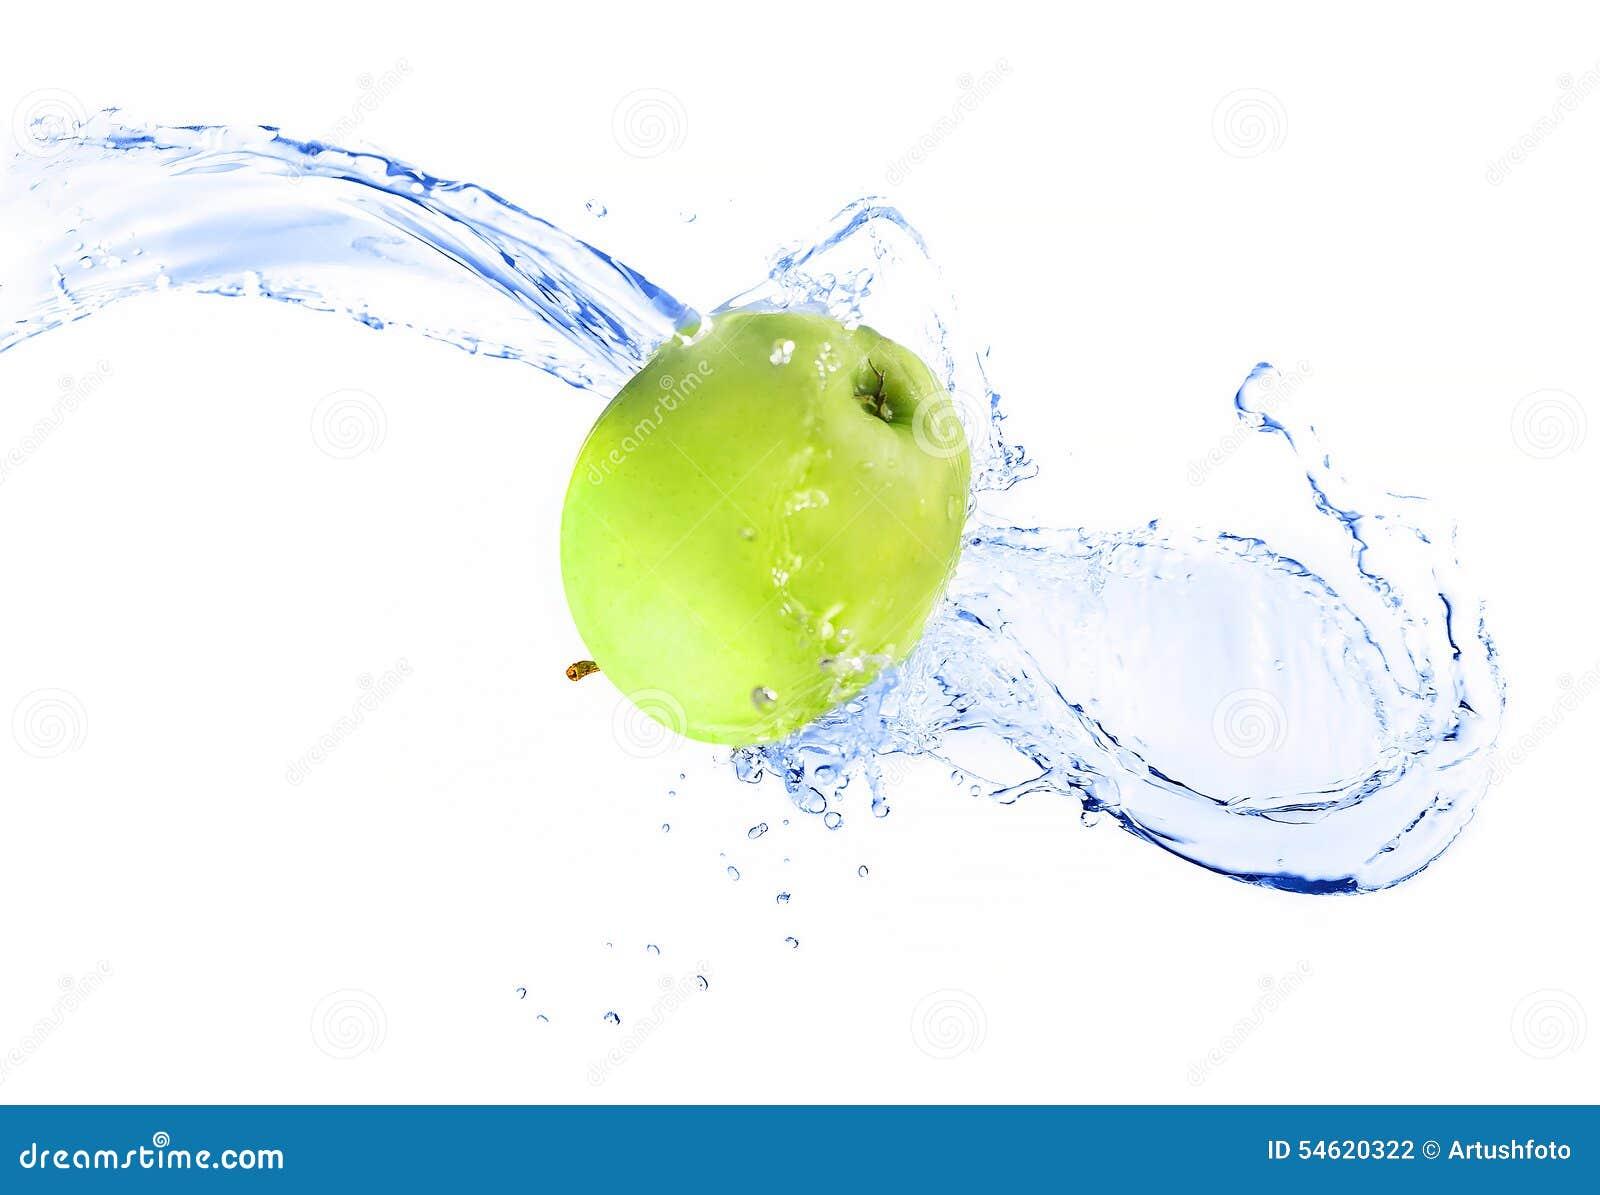 Natural Sour Spray Food